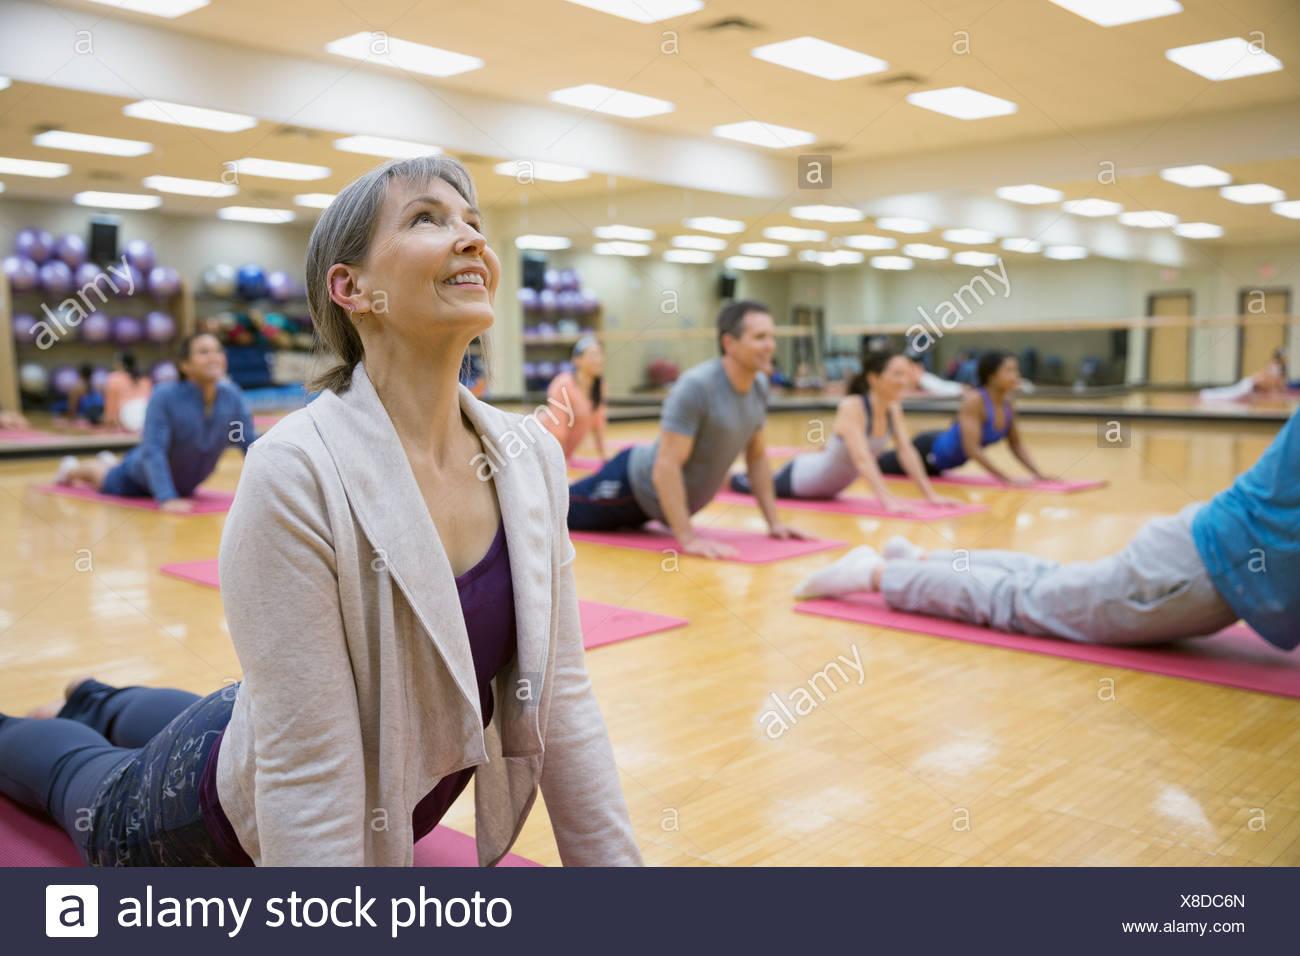 Group practicing upward facing dog in yoga class - Stock Image